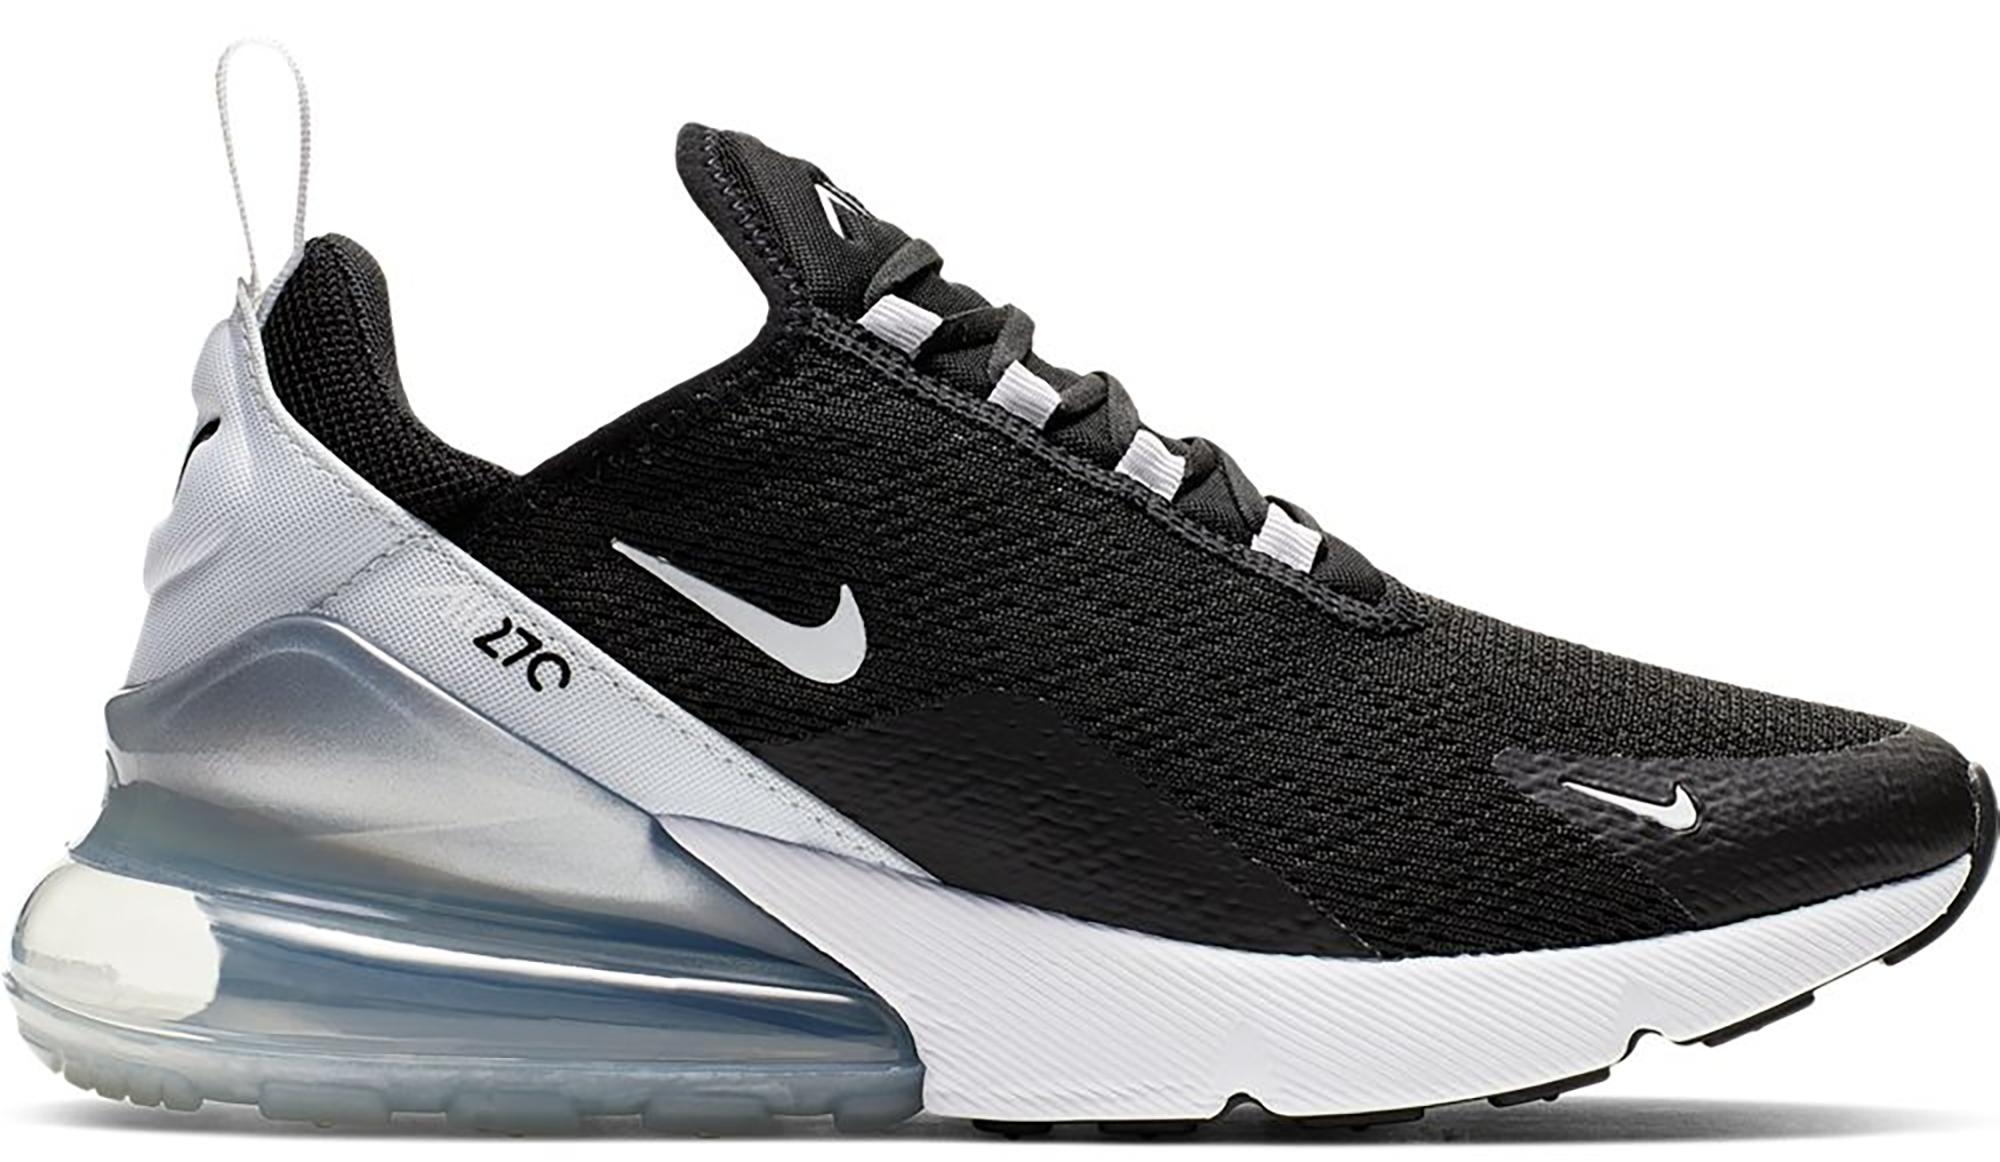 Nike Air Max 270 Black White Pure